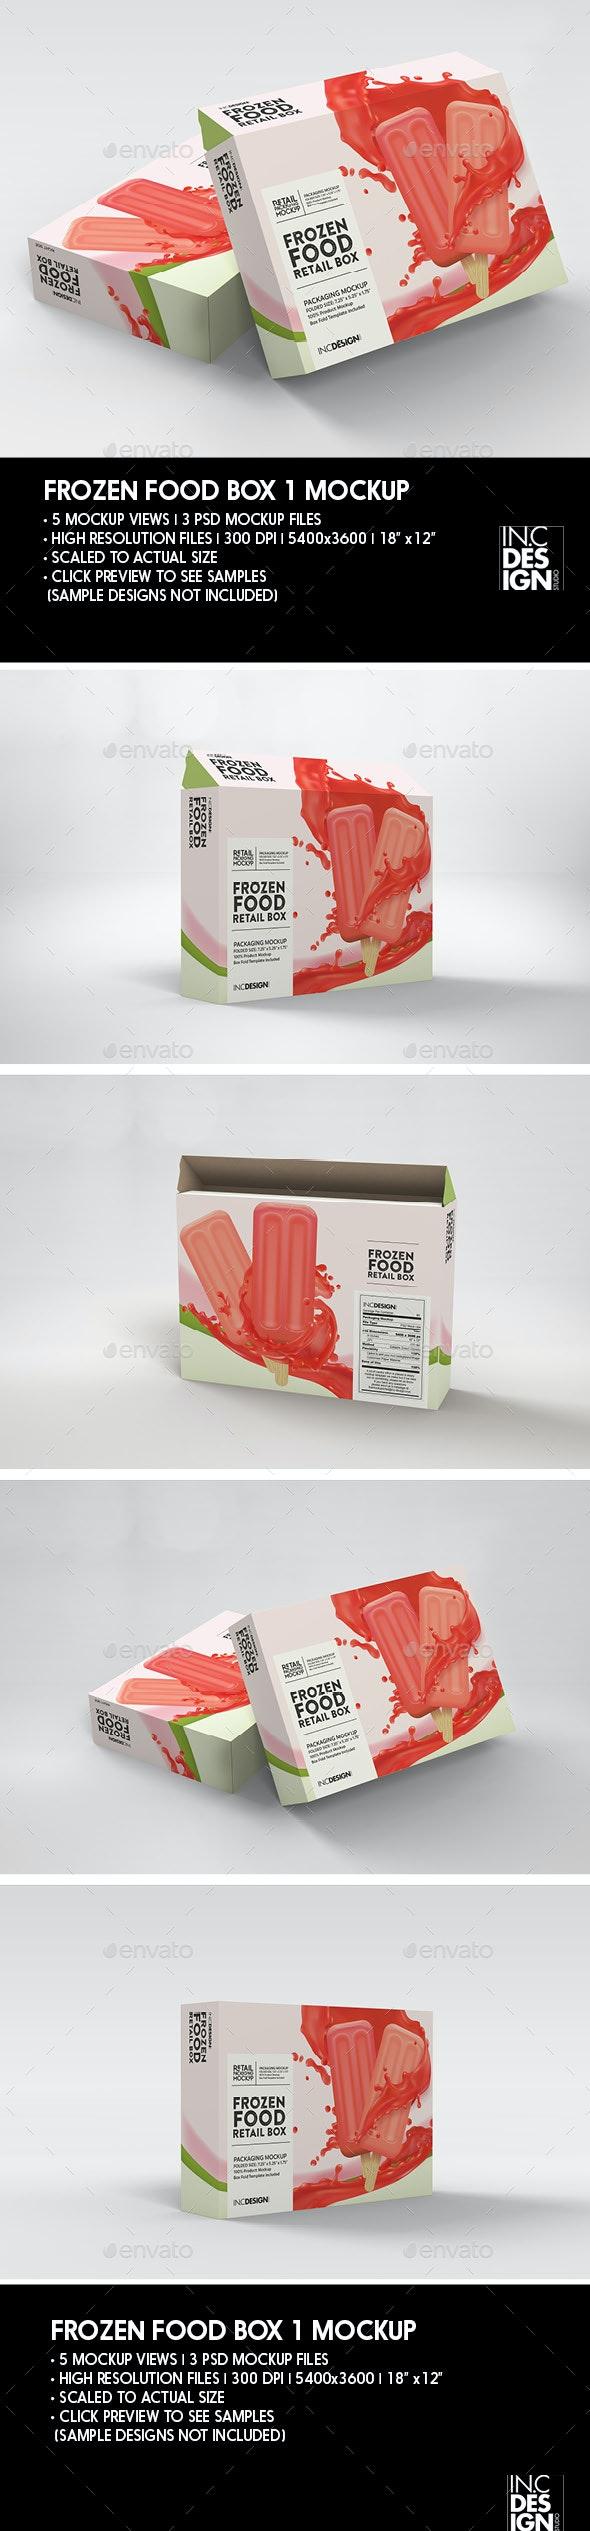 Thin Frozen Food Box Packaging Mockup - Packaging Product Mock-Ups